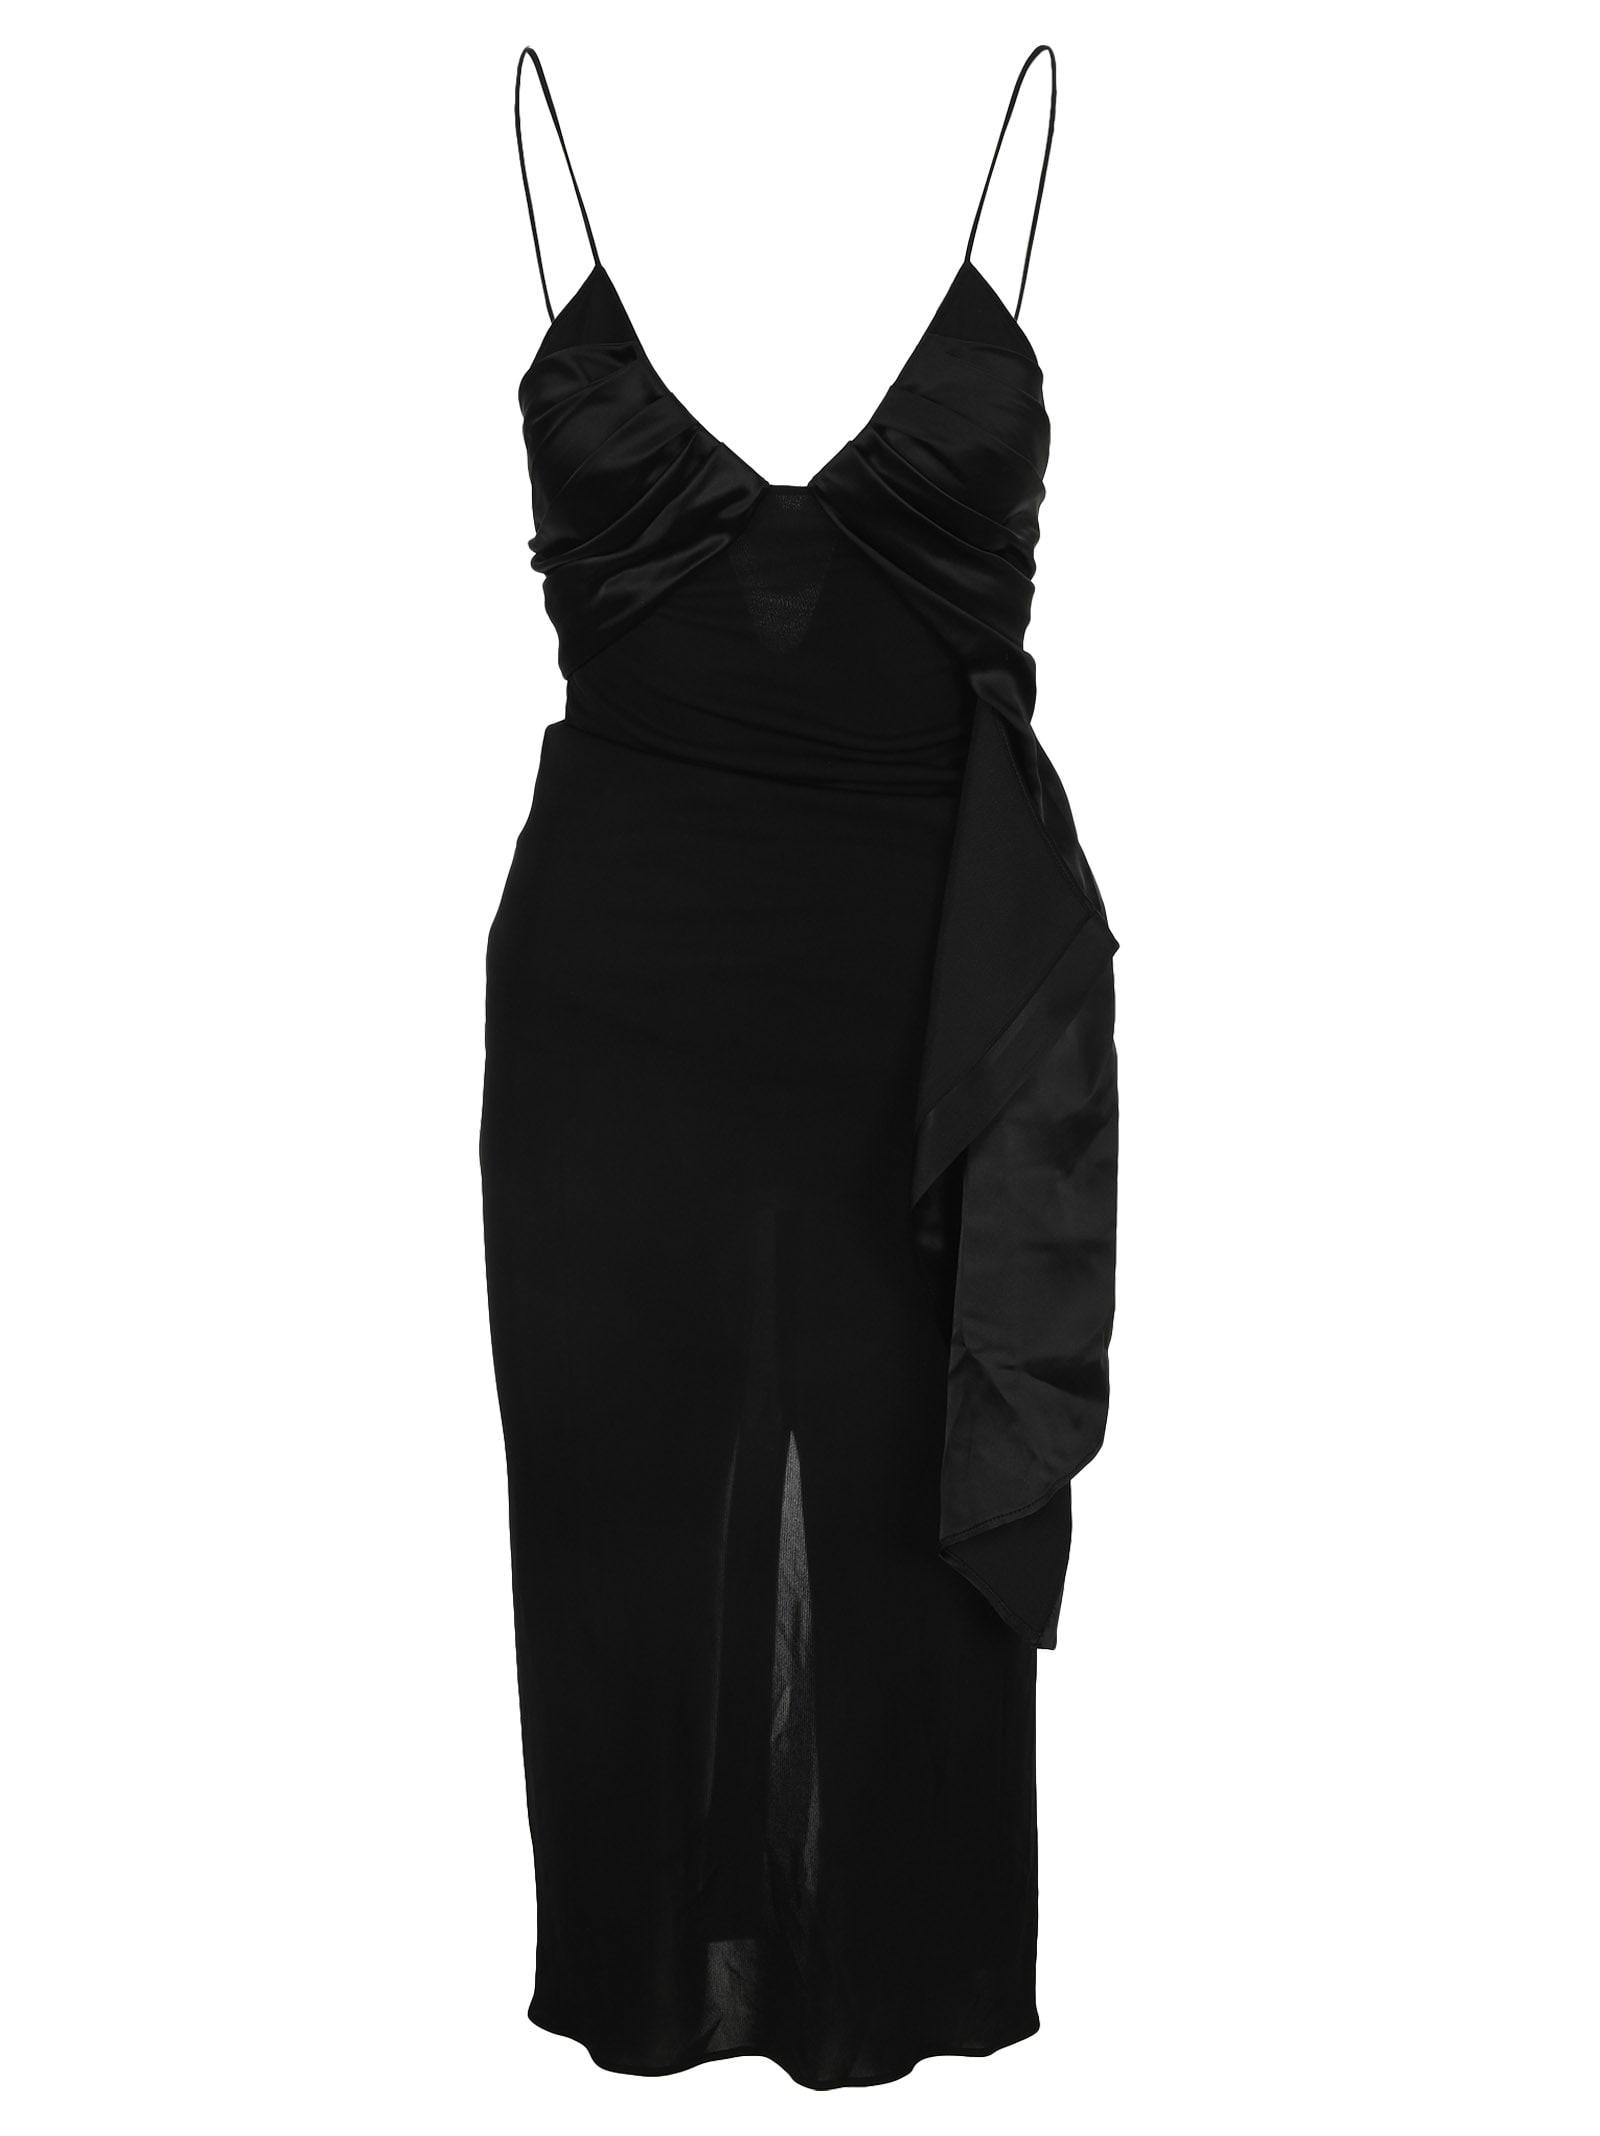 Buy 1017 ALYX 9SM Alyx Foulard Formal Long Sleeves online, shop 1017 ALYX 9SM with free shipping